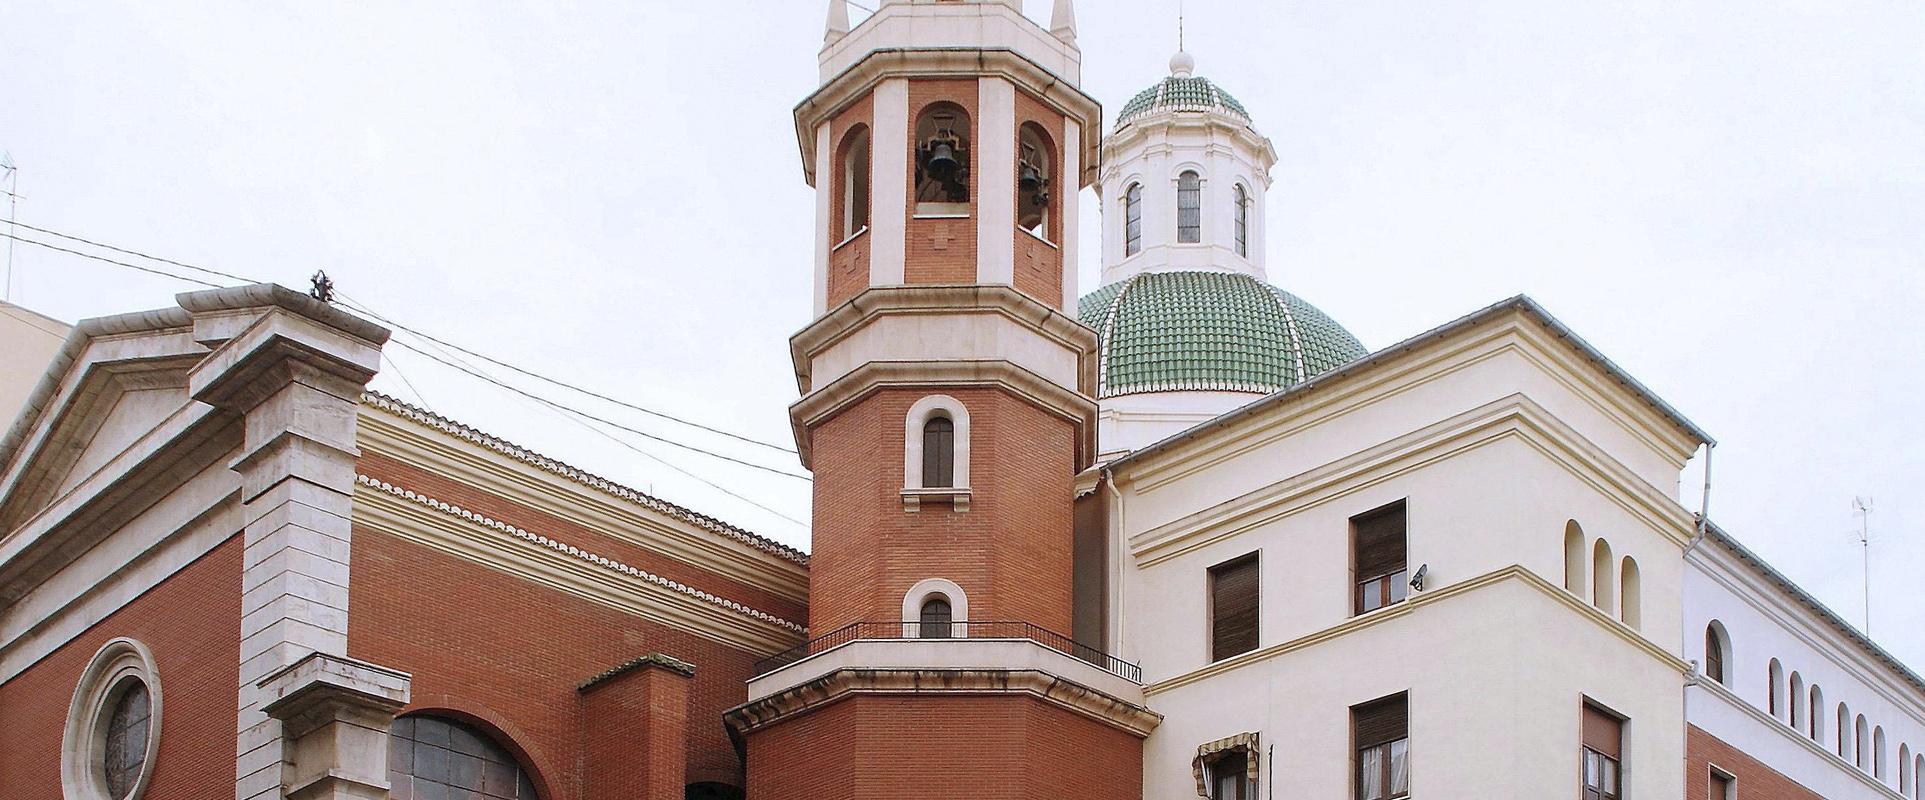 Parroquia santo ngel custodio for Horario oficina correos valencia